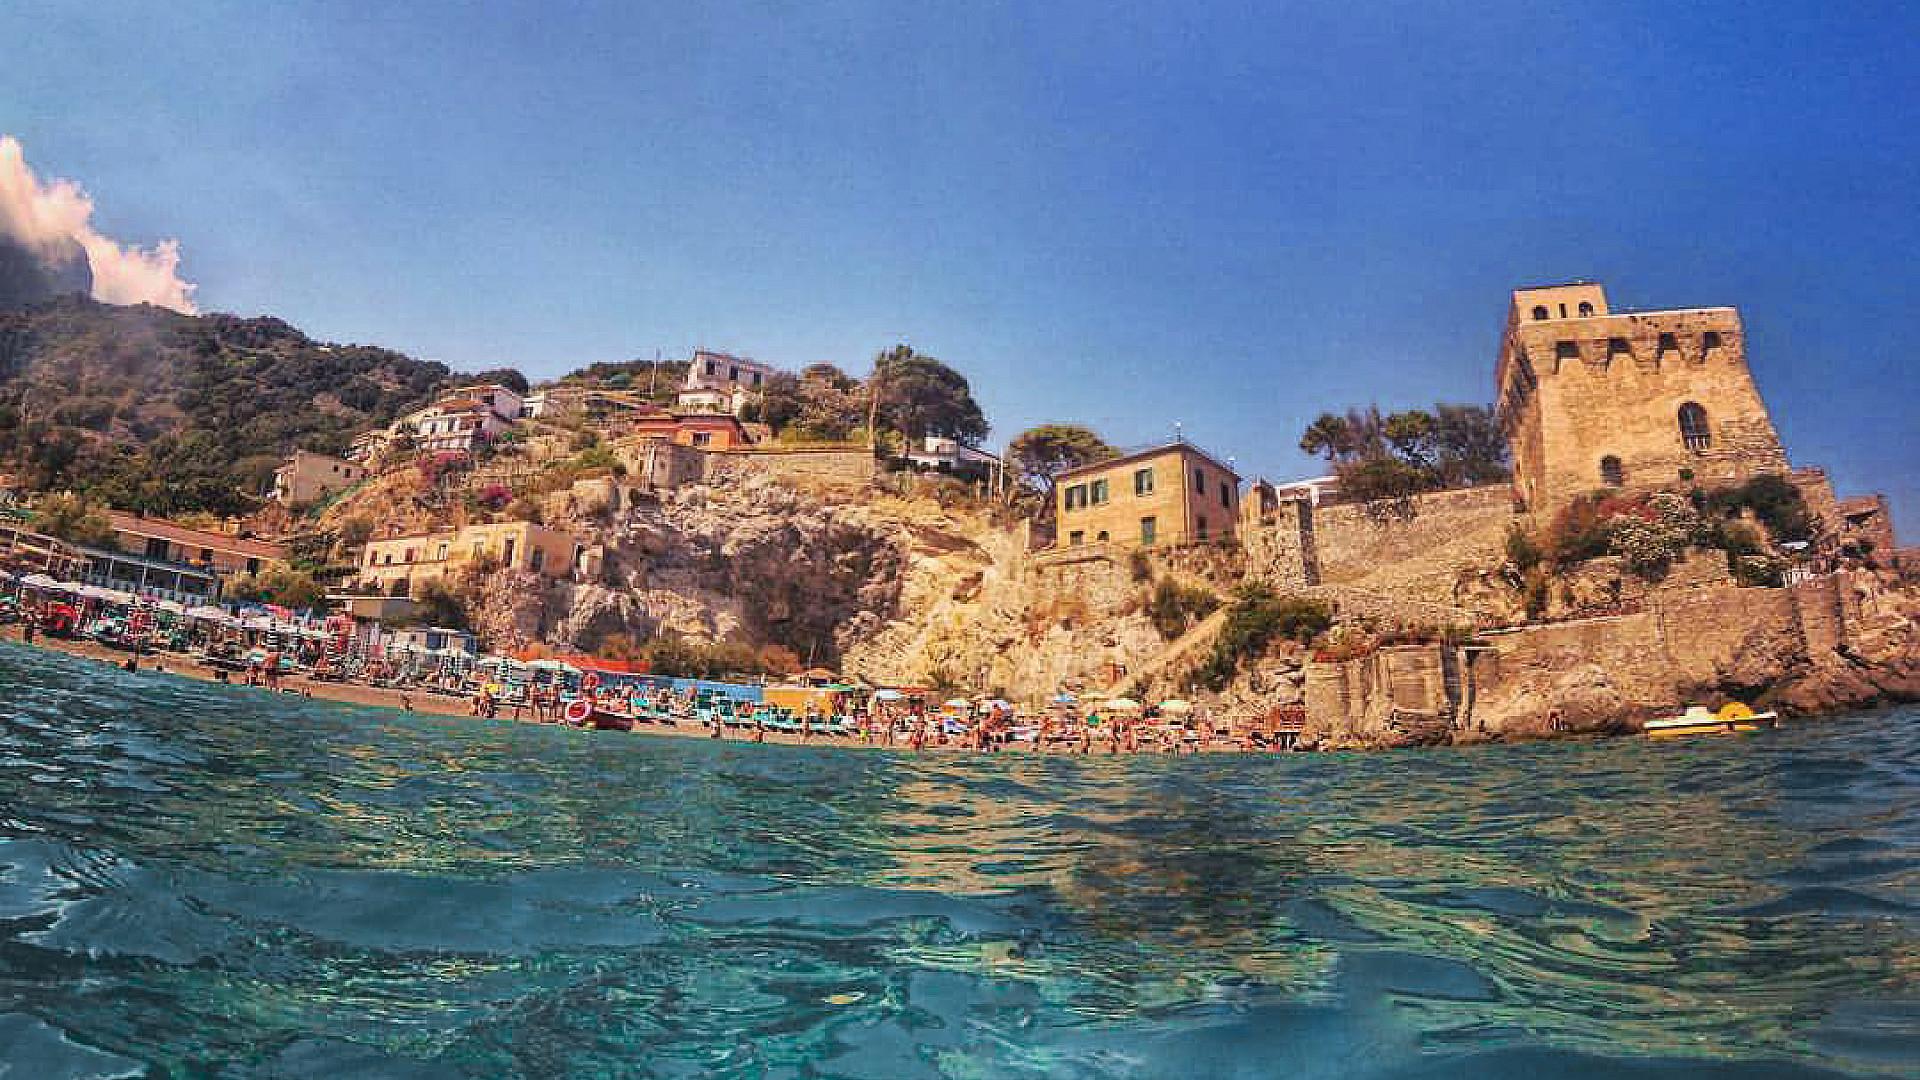 Spiaggia di Erchie